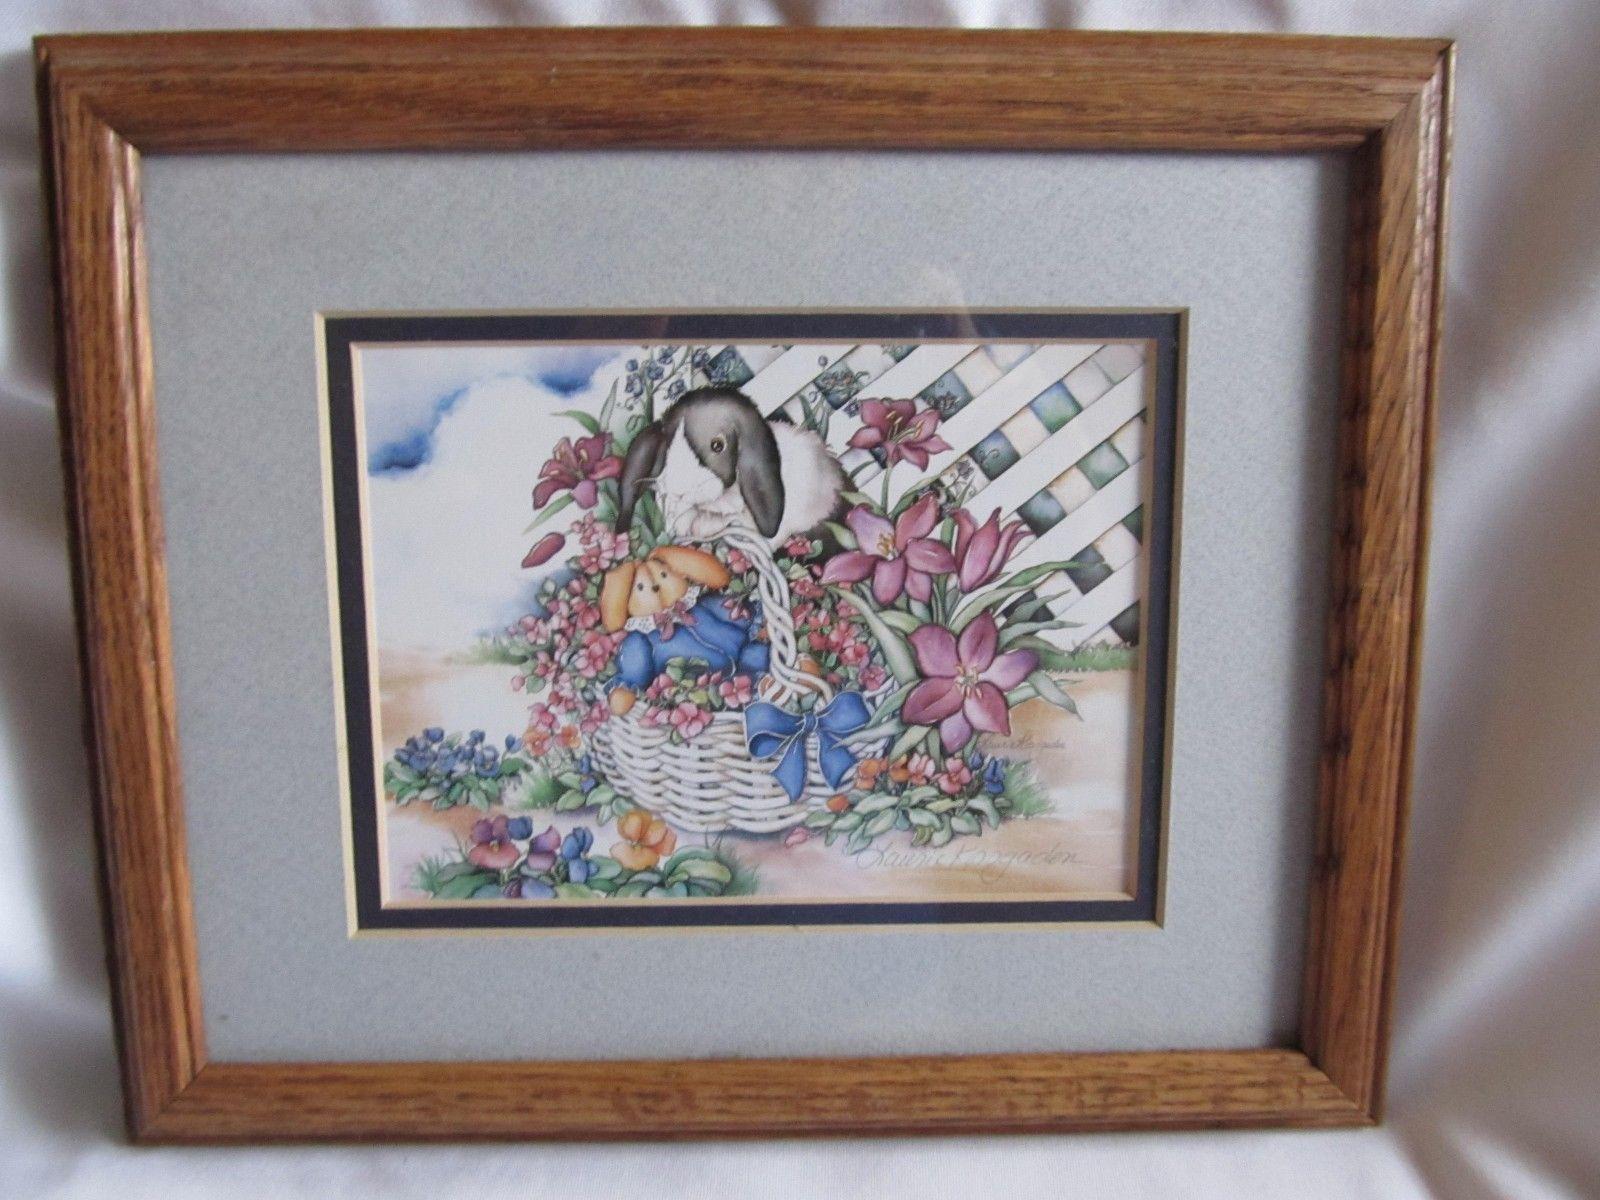 "Laurie Korsgaden SIGNED Peek A Bunny  Print Framed &  Matted 11.5"" x 9.5"""